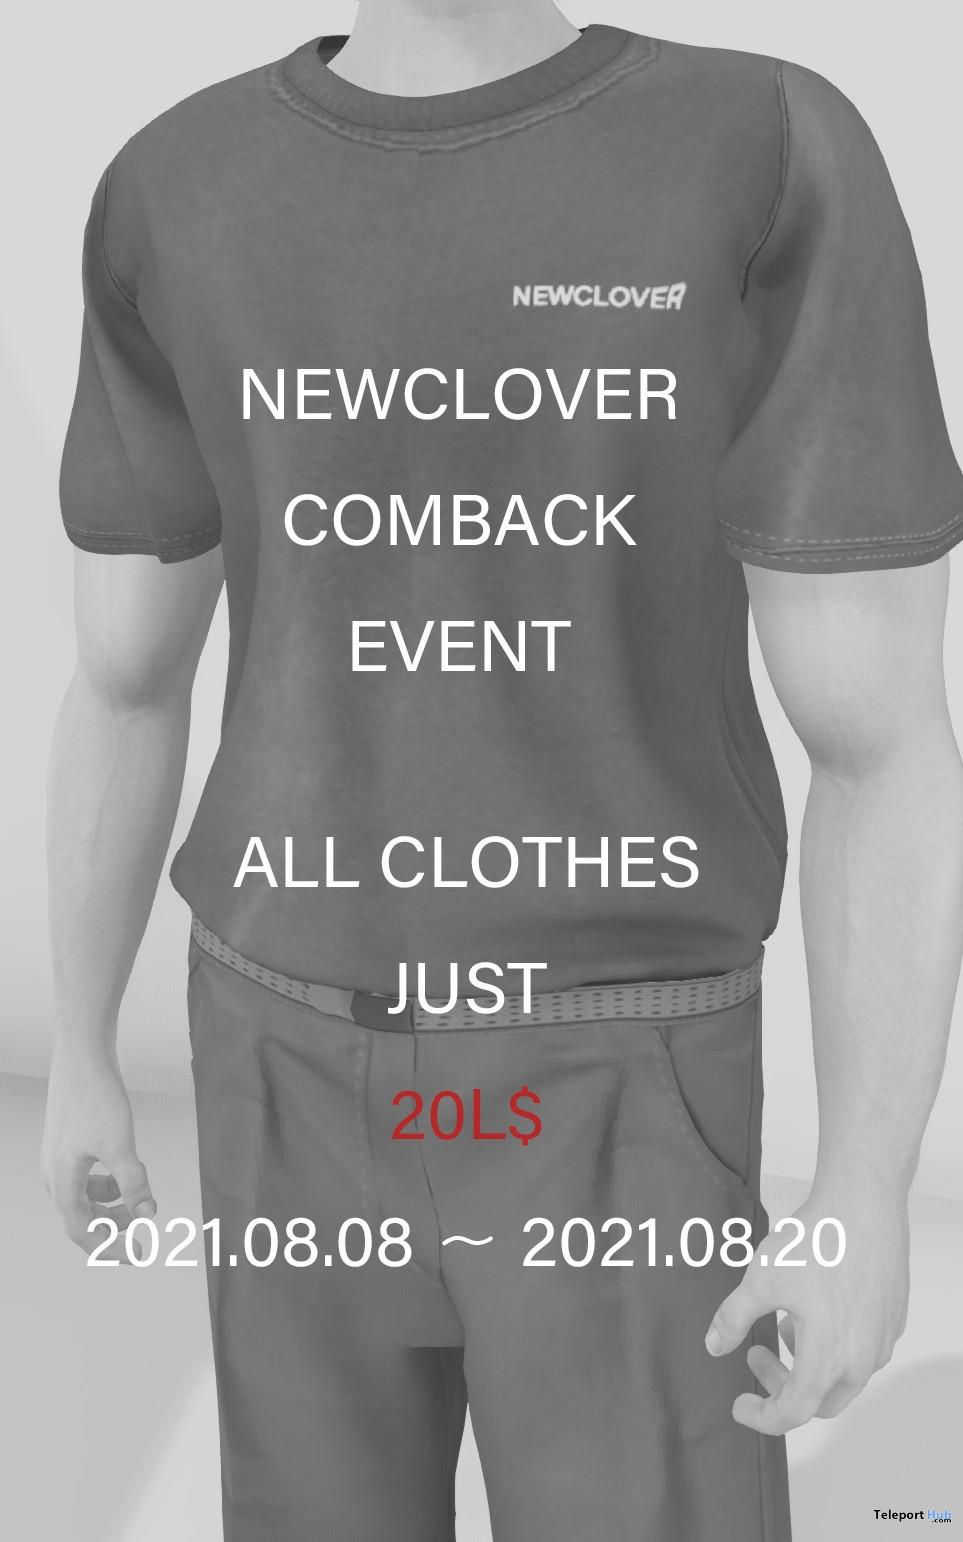 NEWCLOVER Come Back 20L Sale Event 2021 - Teleport Hub - teleporthub.com